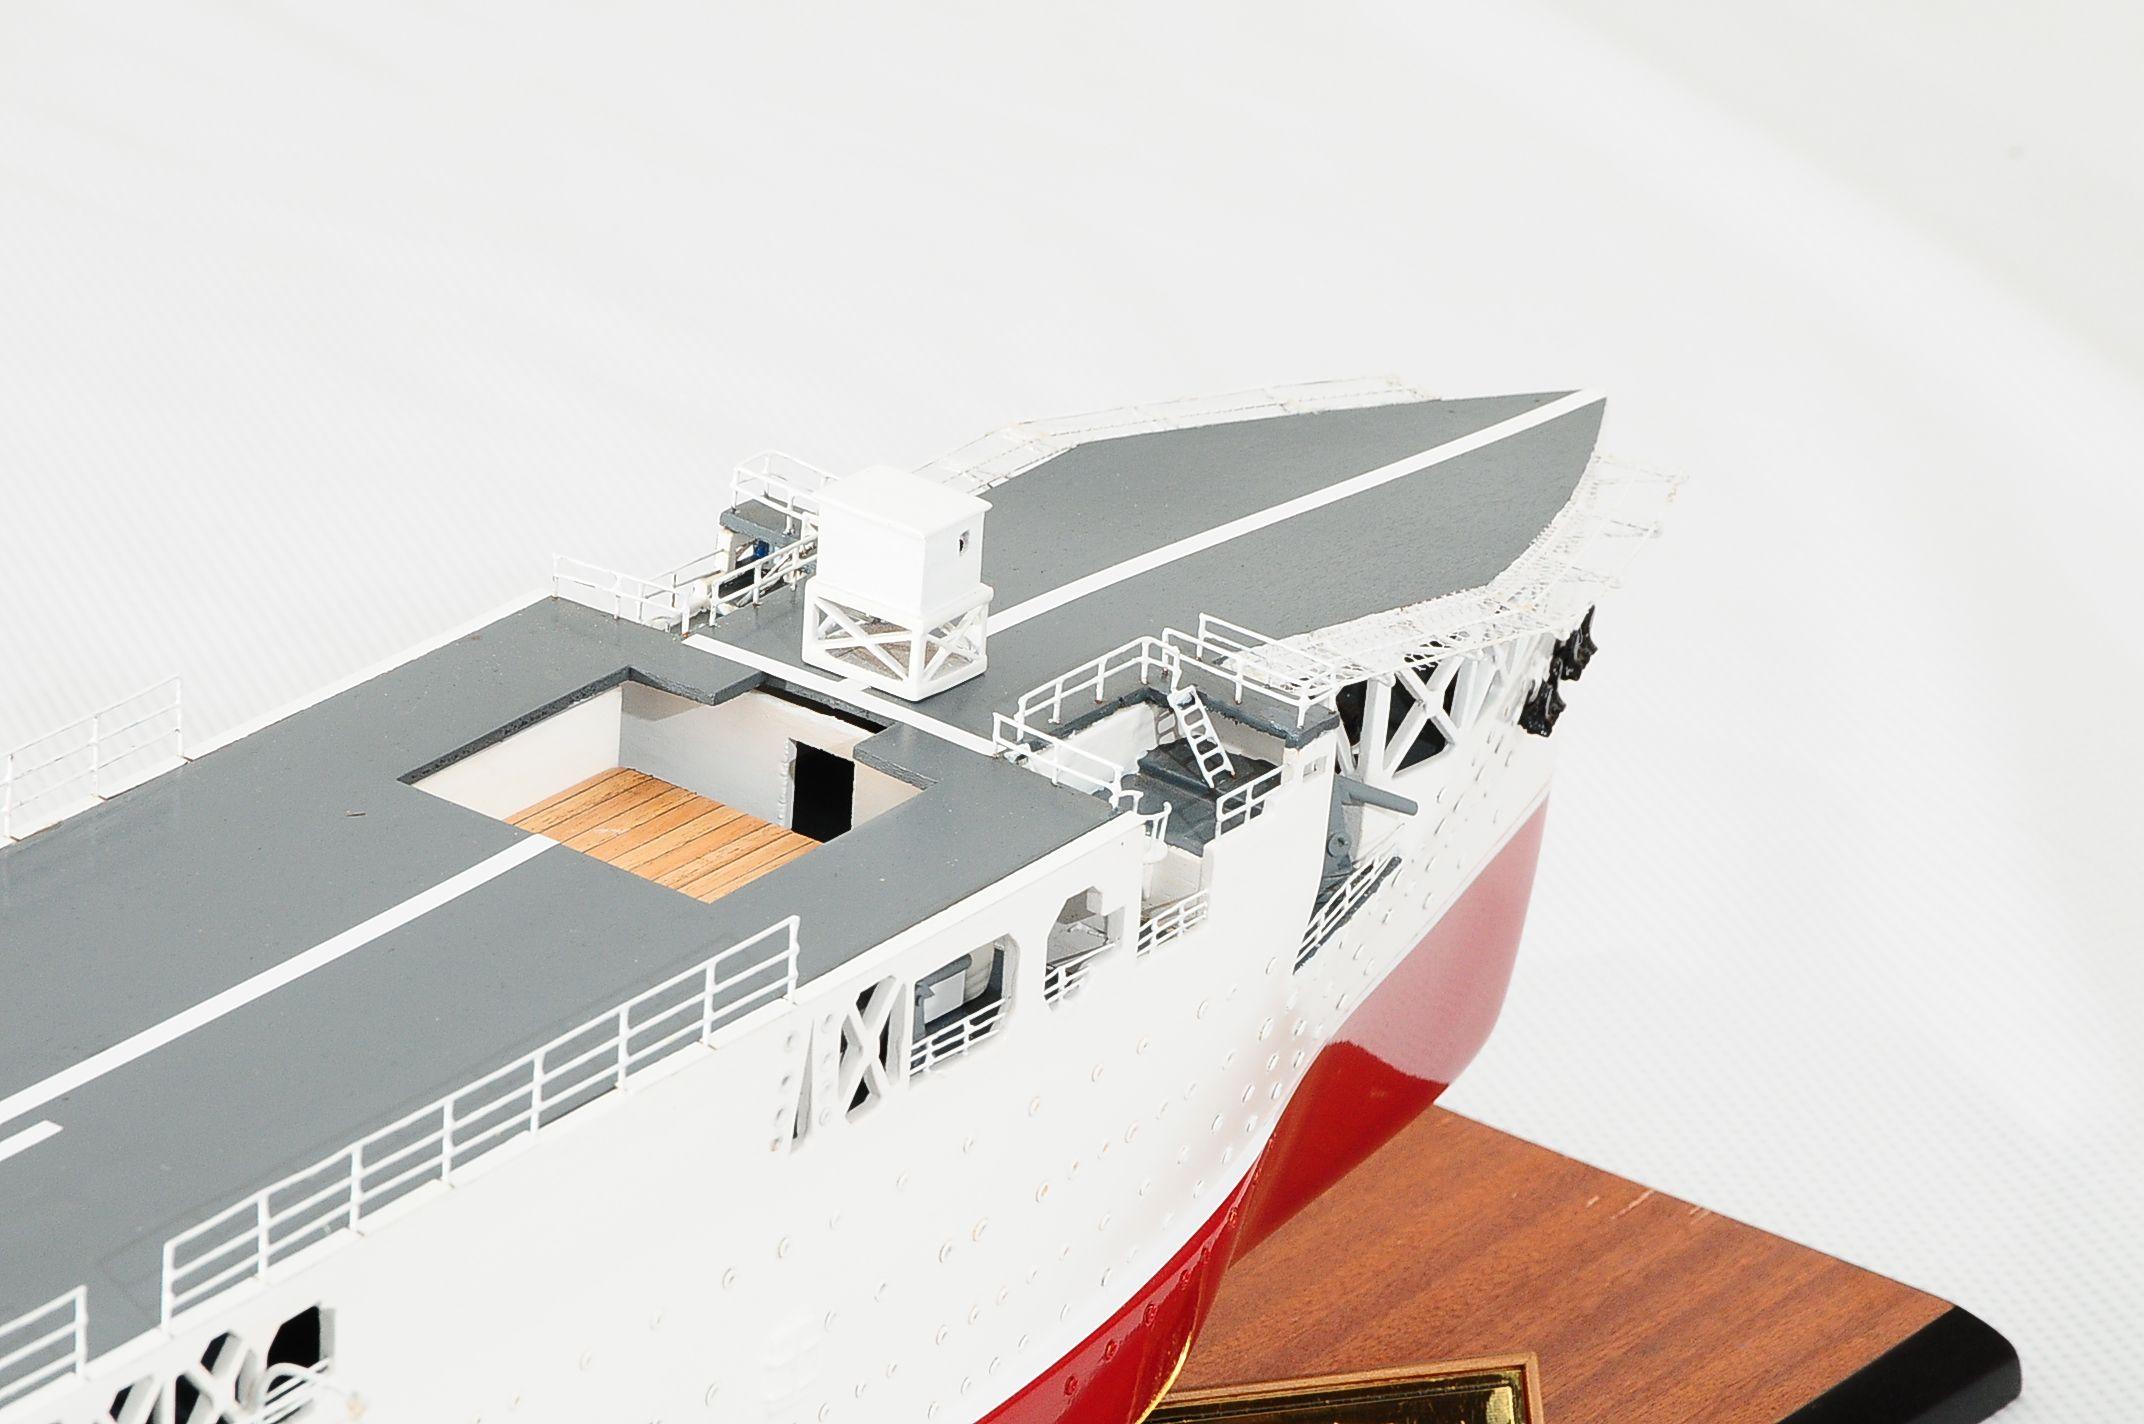 663-6137-HMS-Argus-Model-Boat